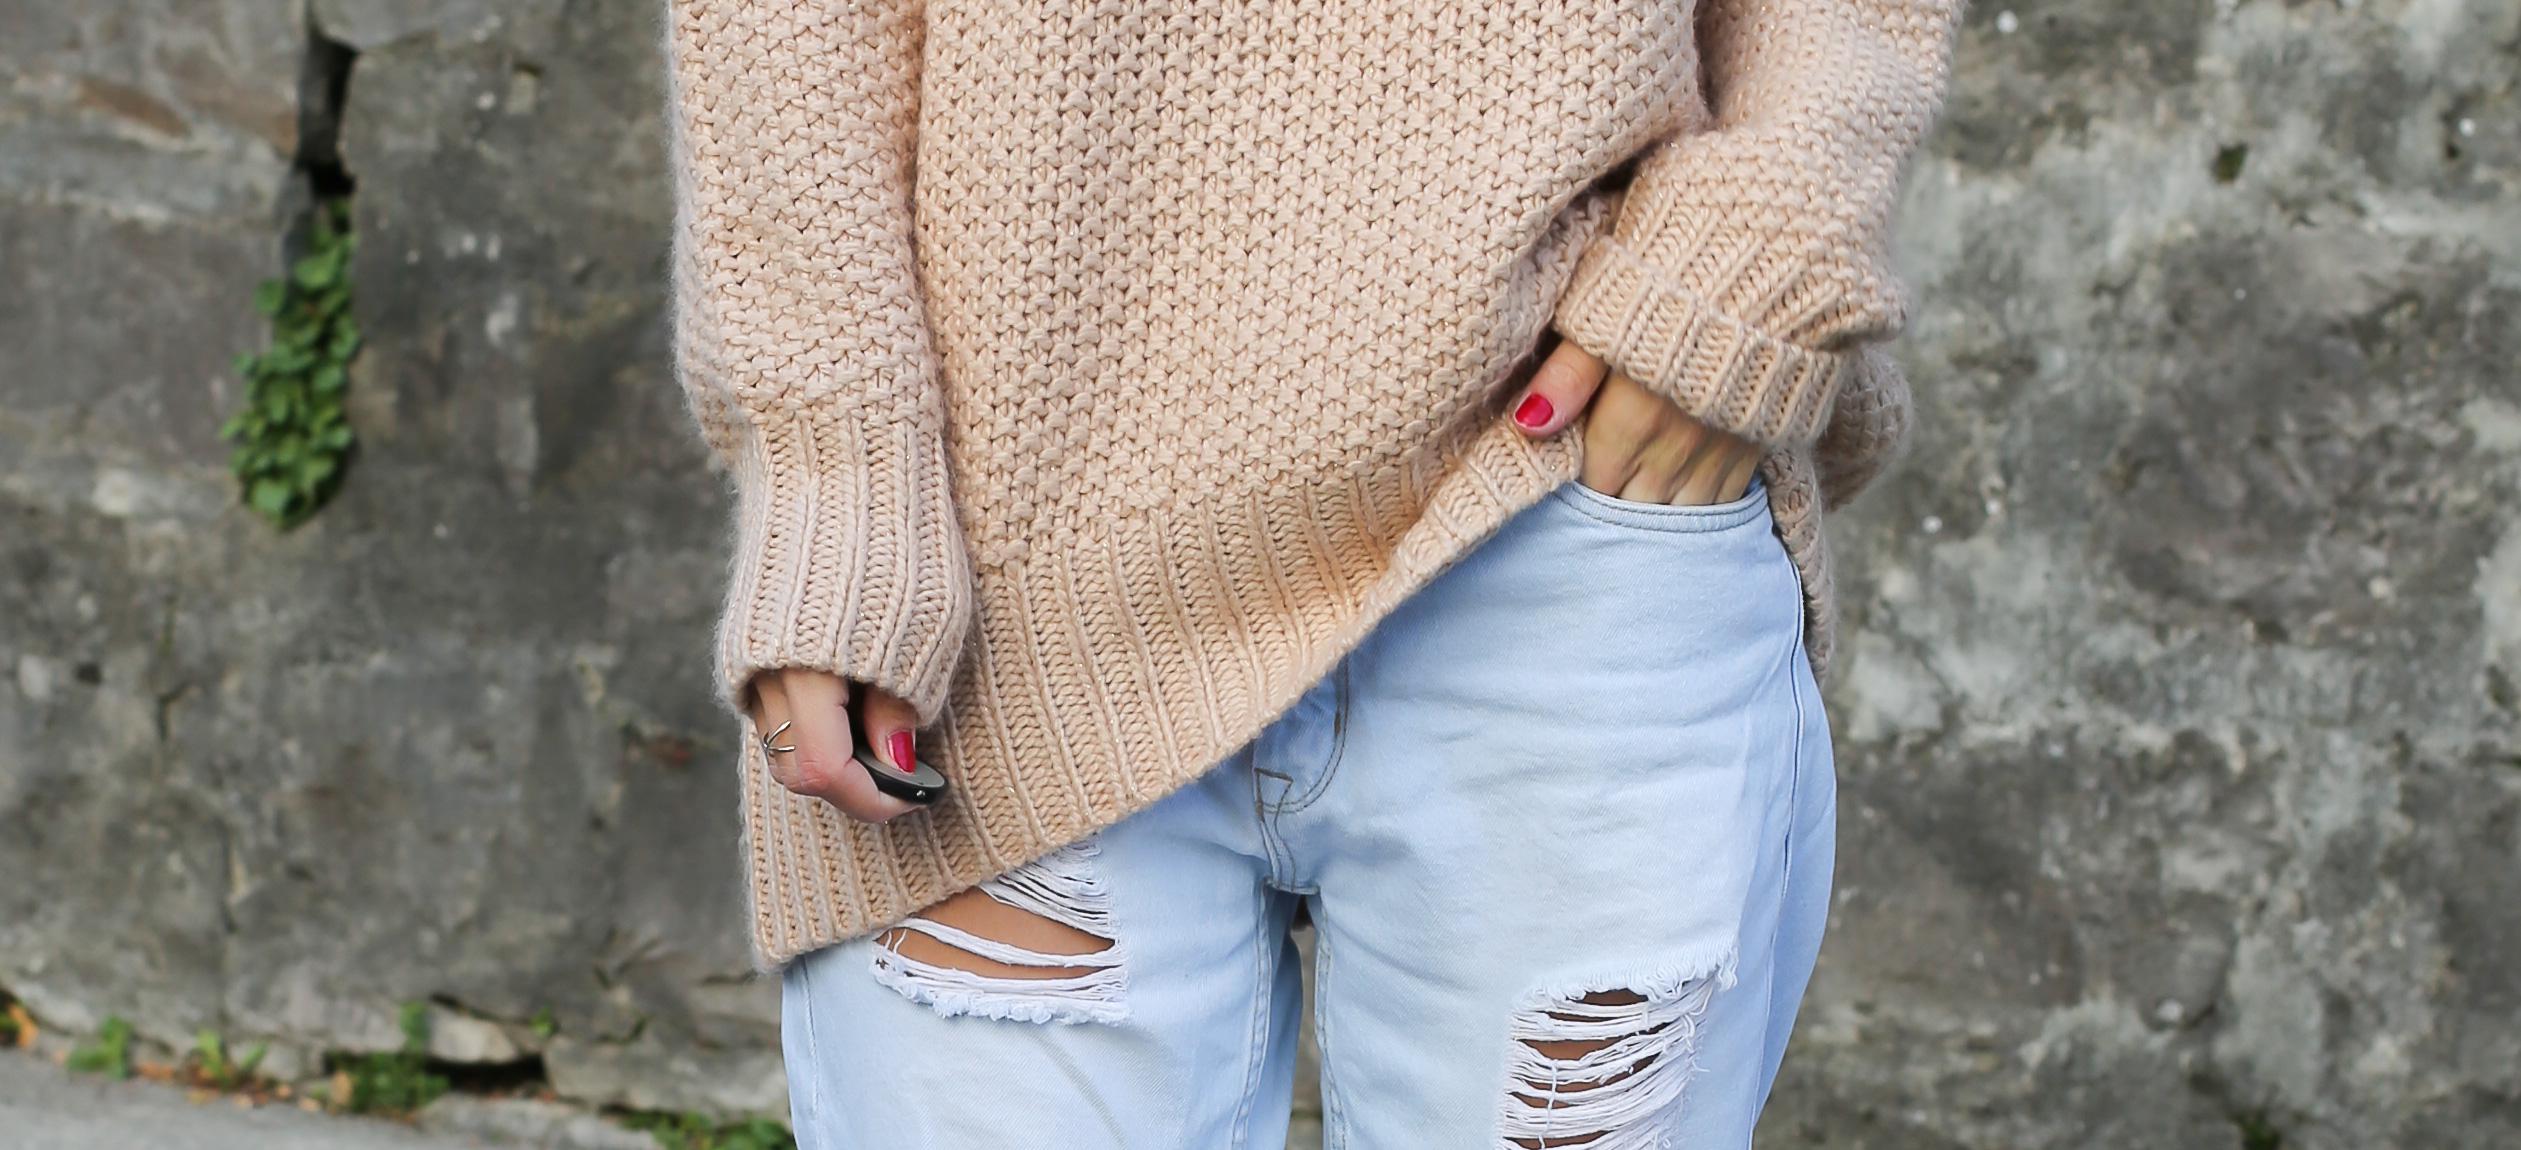 blog-mode-suisse-veste-blanche-perles-pull-rose5